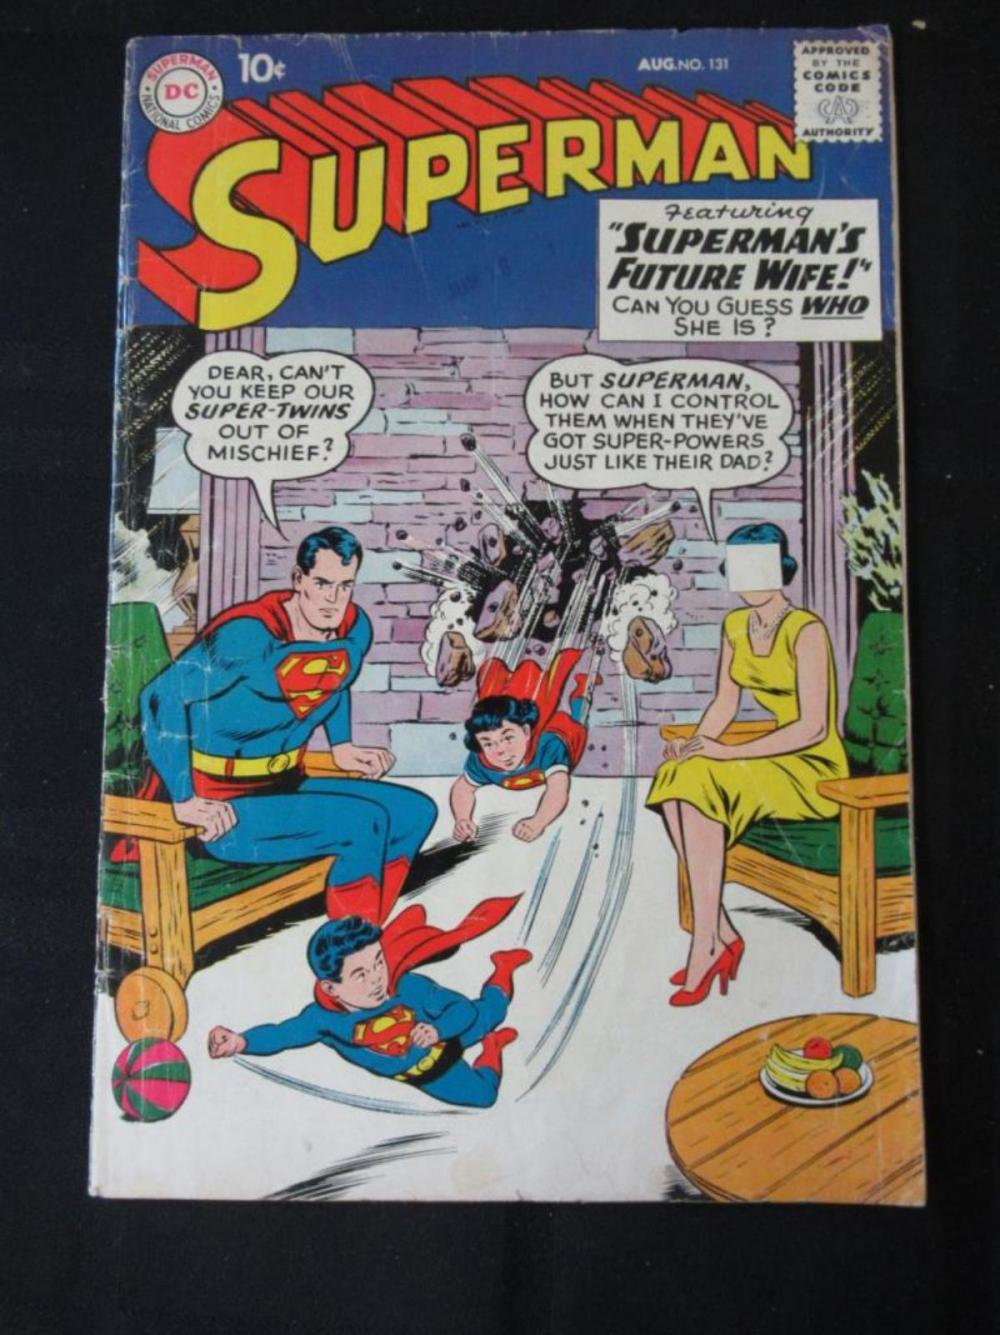 Superman 10c #131 Future Wife